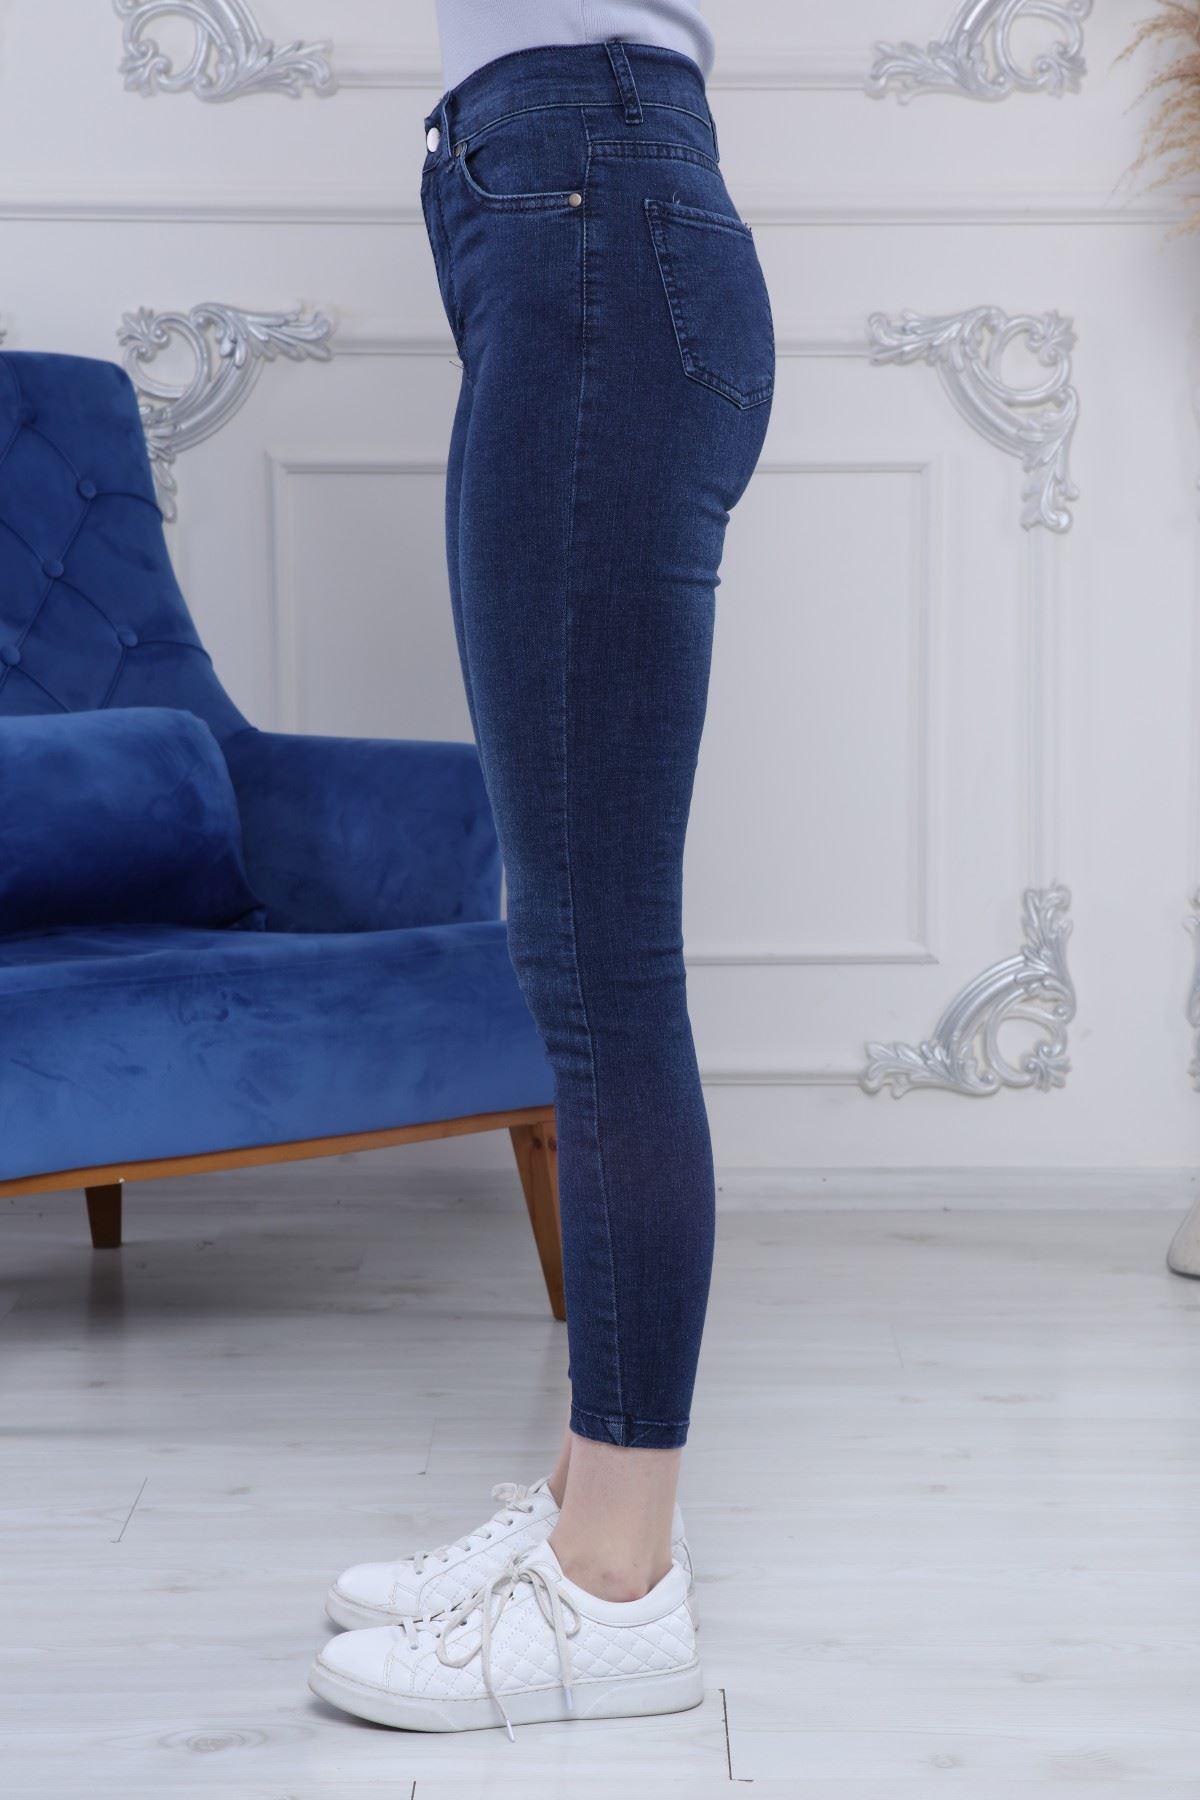 Yüksek Bel Bilekte Kot Pantolon